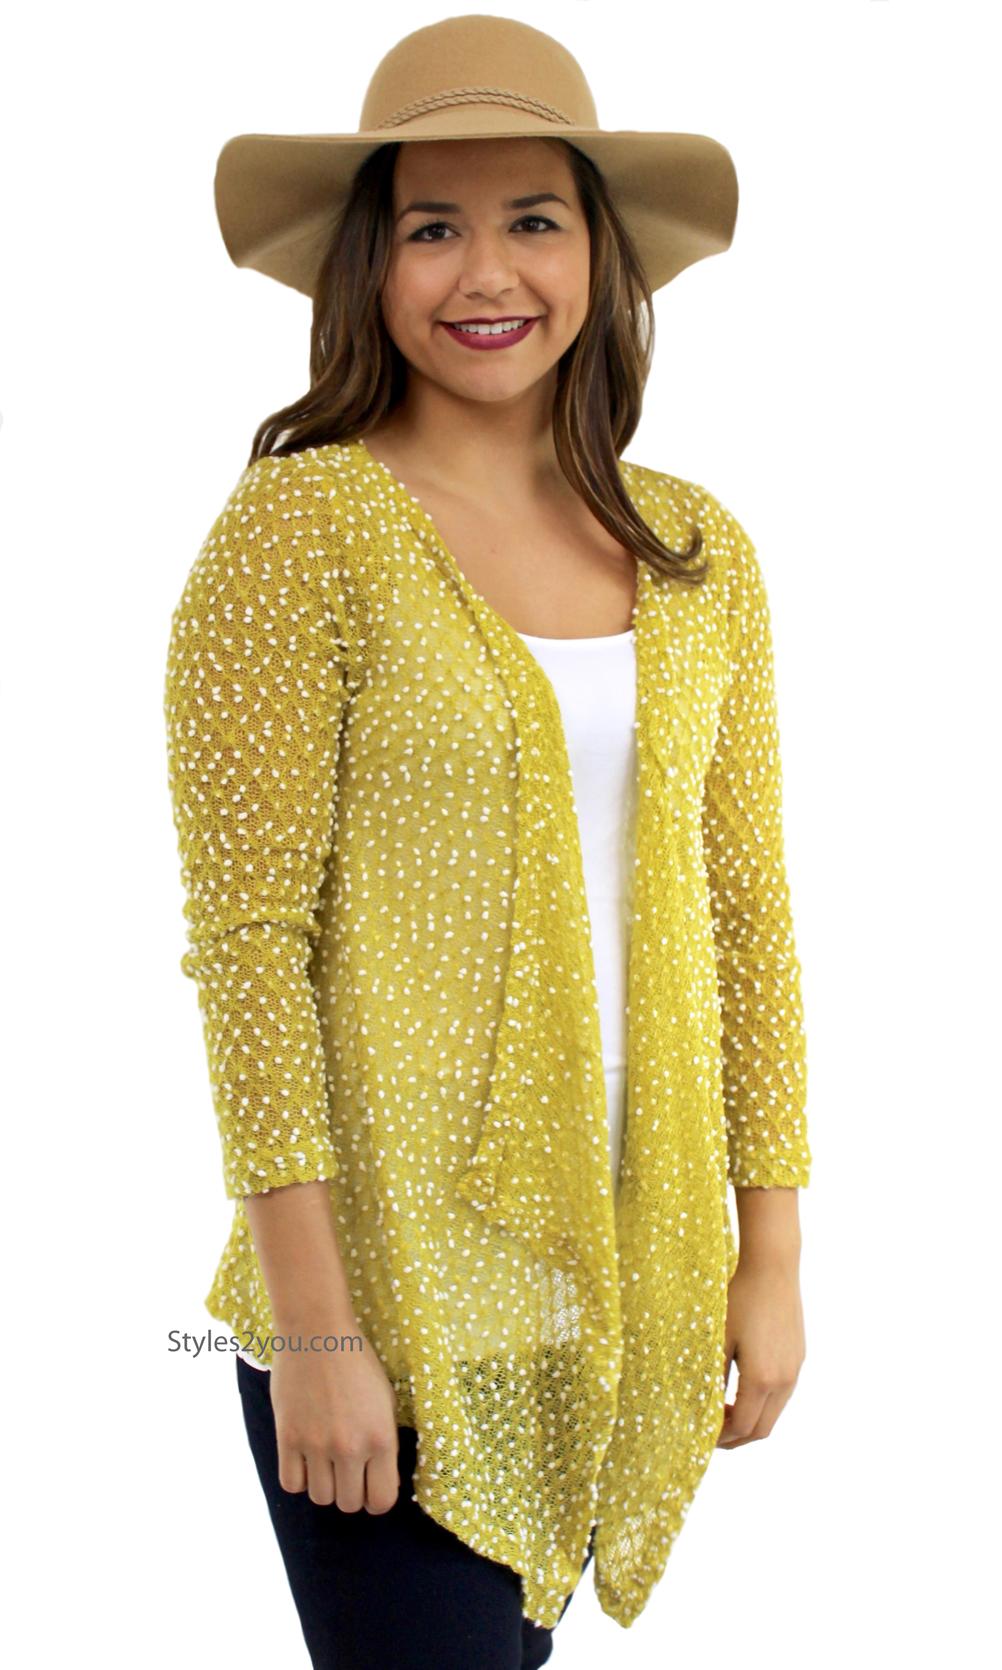 8ae06250280c0f Liam Ladies Lightweight Knit Sweater Cardigan Bolero In Yellow [NC25150 Shana  K Clothes Cardigan] - $29.00